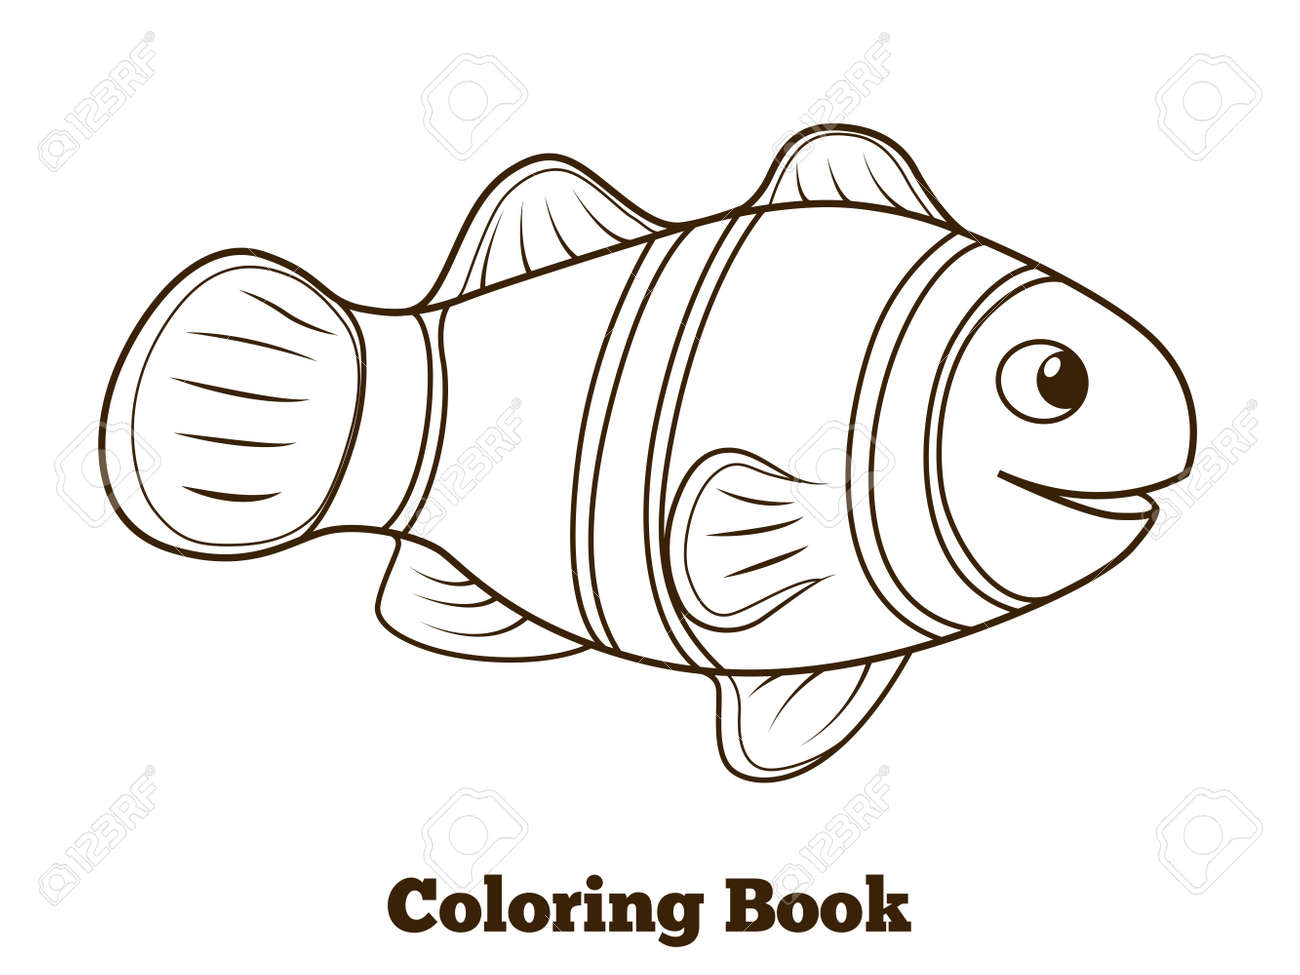 Libro Pez Payaso Para Colorear De Dibujos Animados Peces De Colores